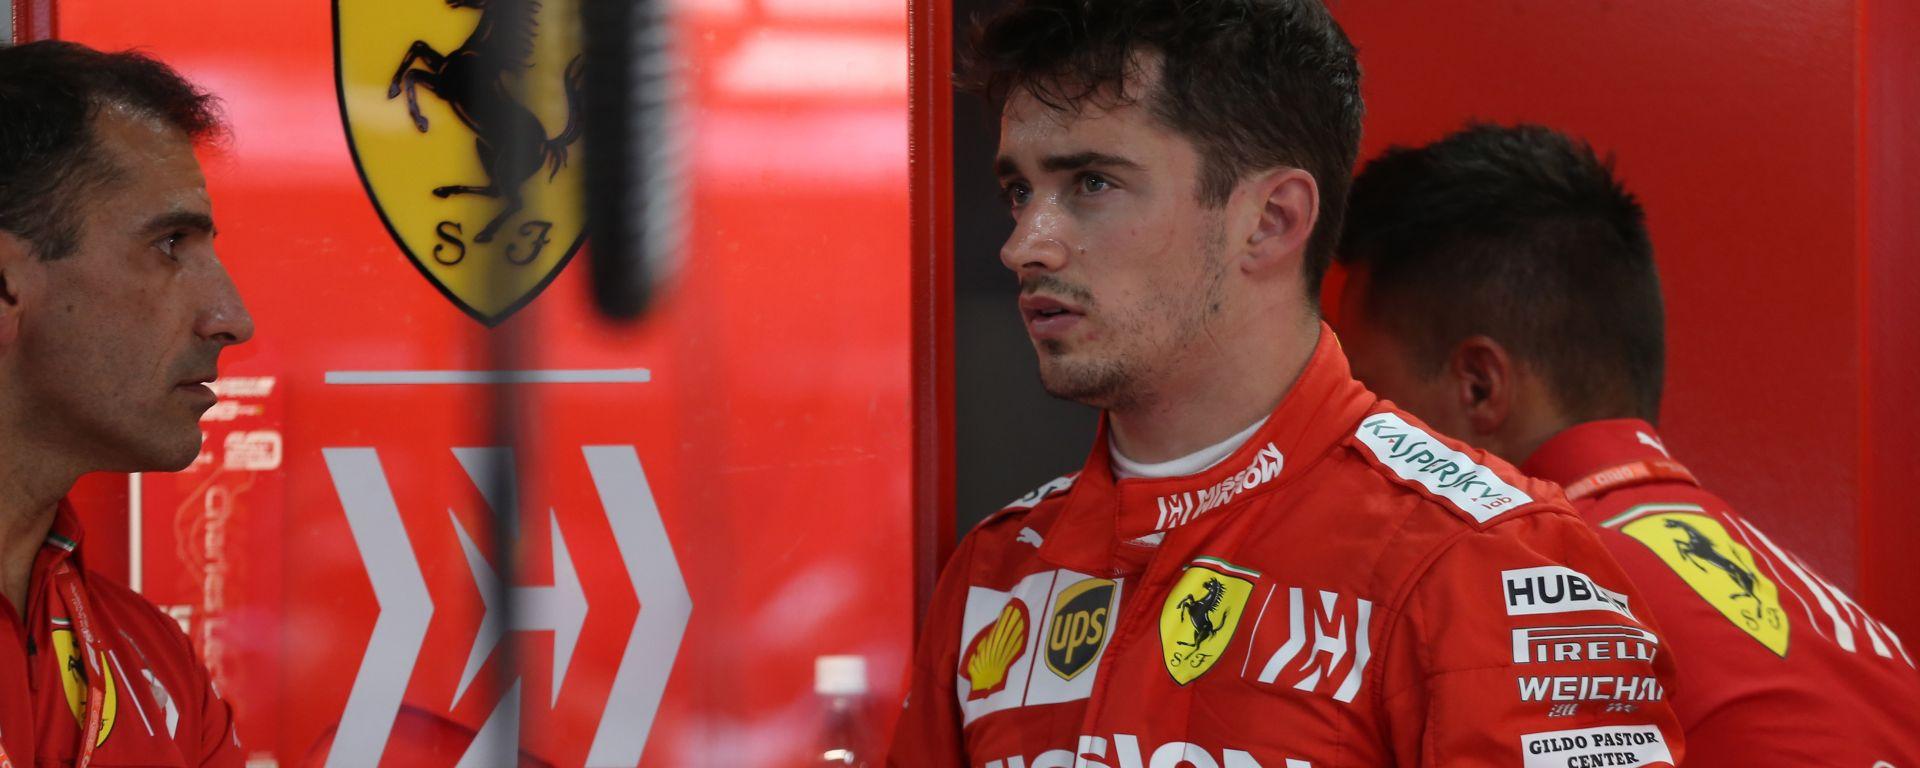 F1, GP Giappone 2019: Charles Leclerc e Marc Gene (Ferrari)